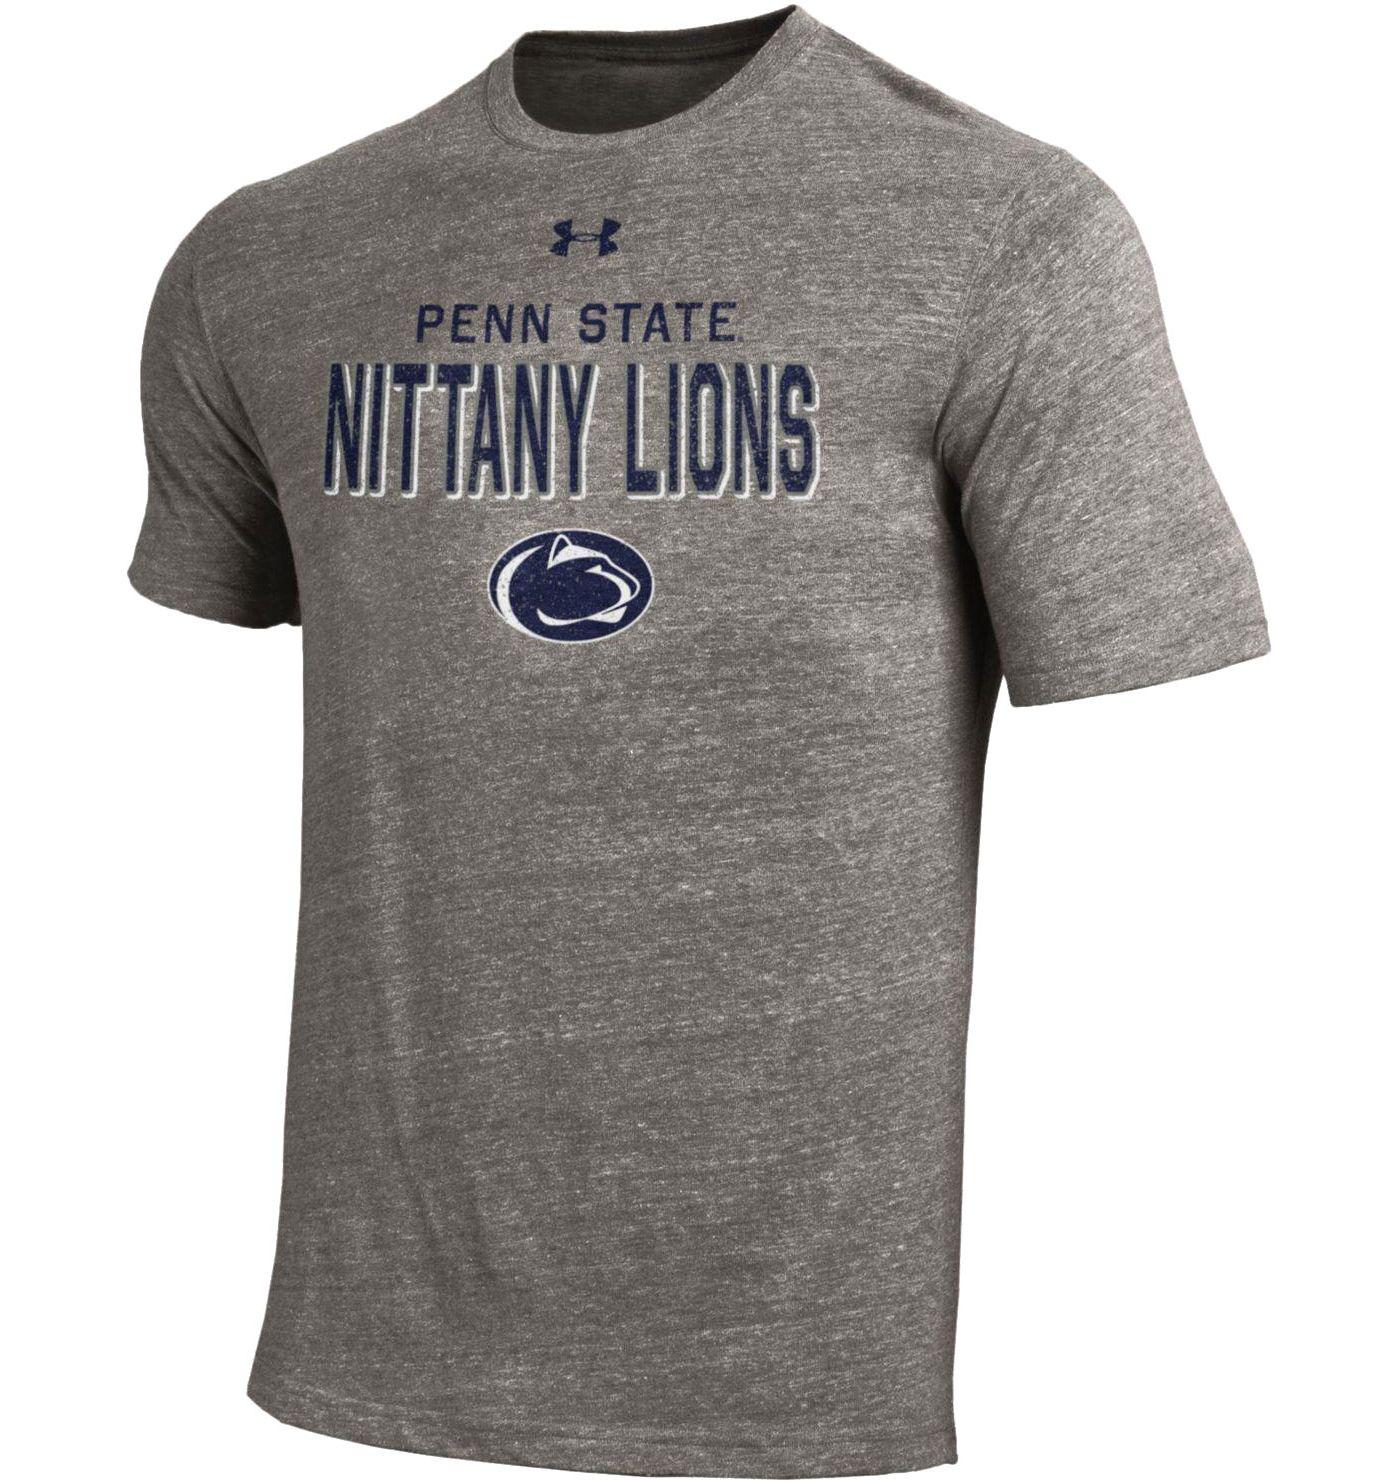 Under Armour Men's Penn State Nittany Lions Grey Tri-Blend Short Sleeve Performance T-Shirt